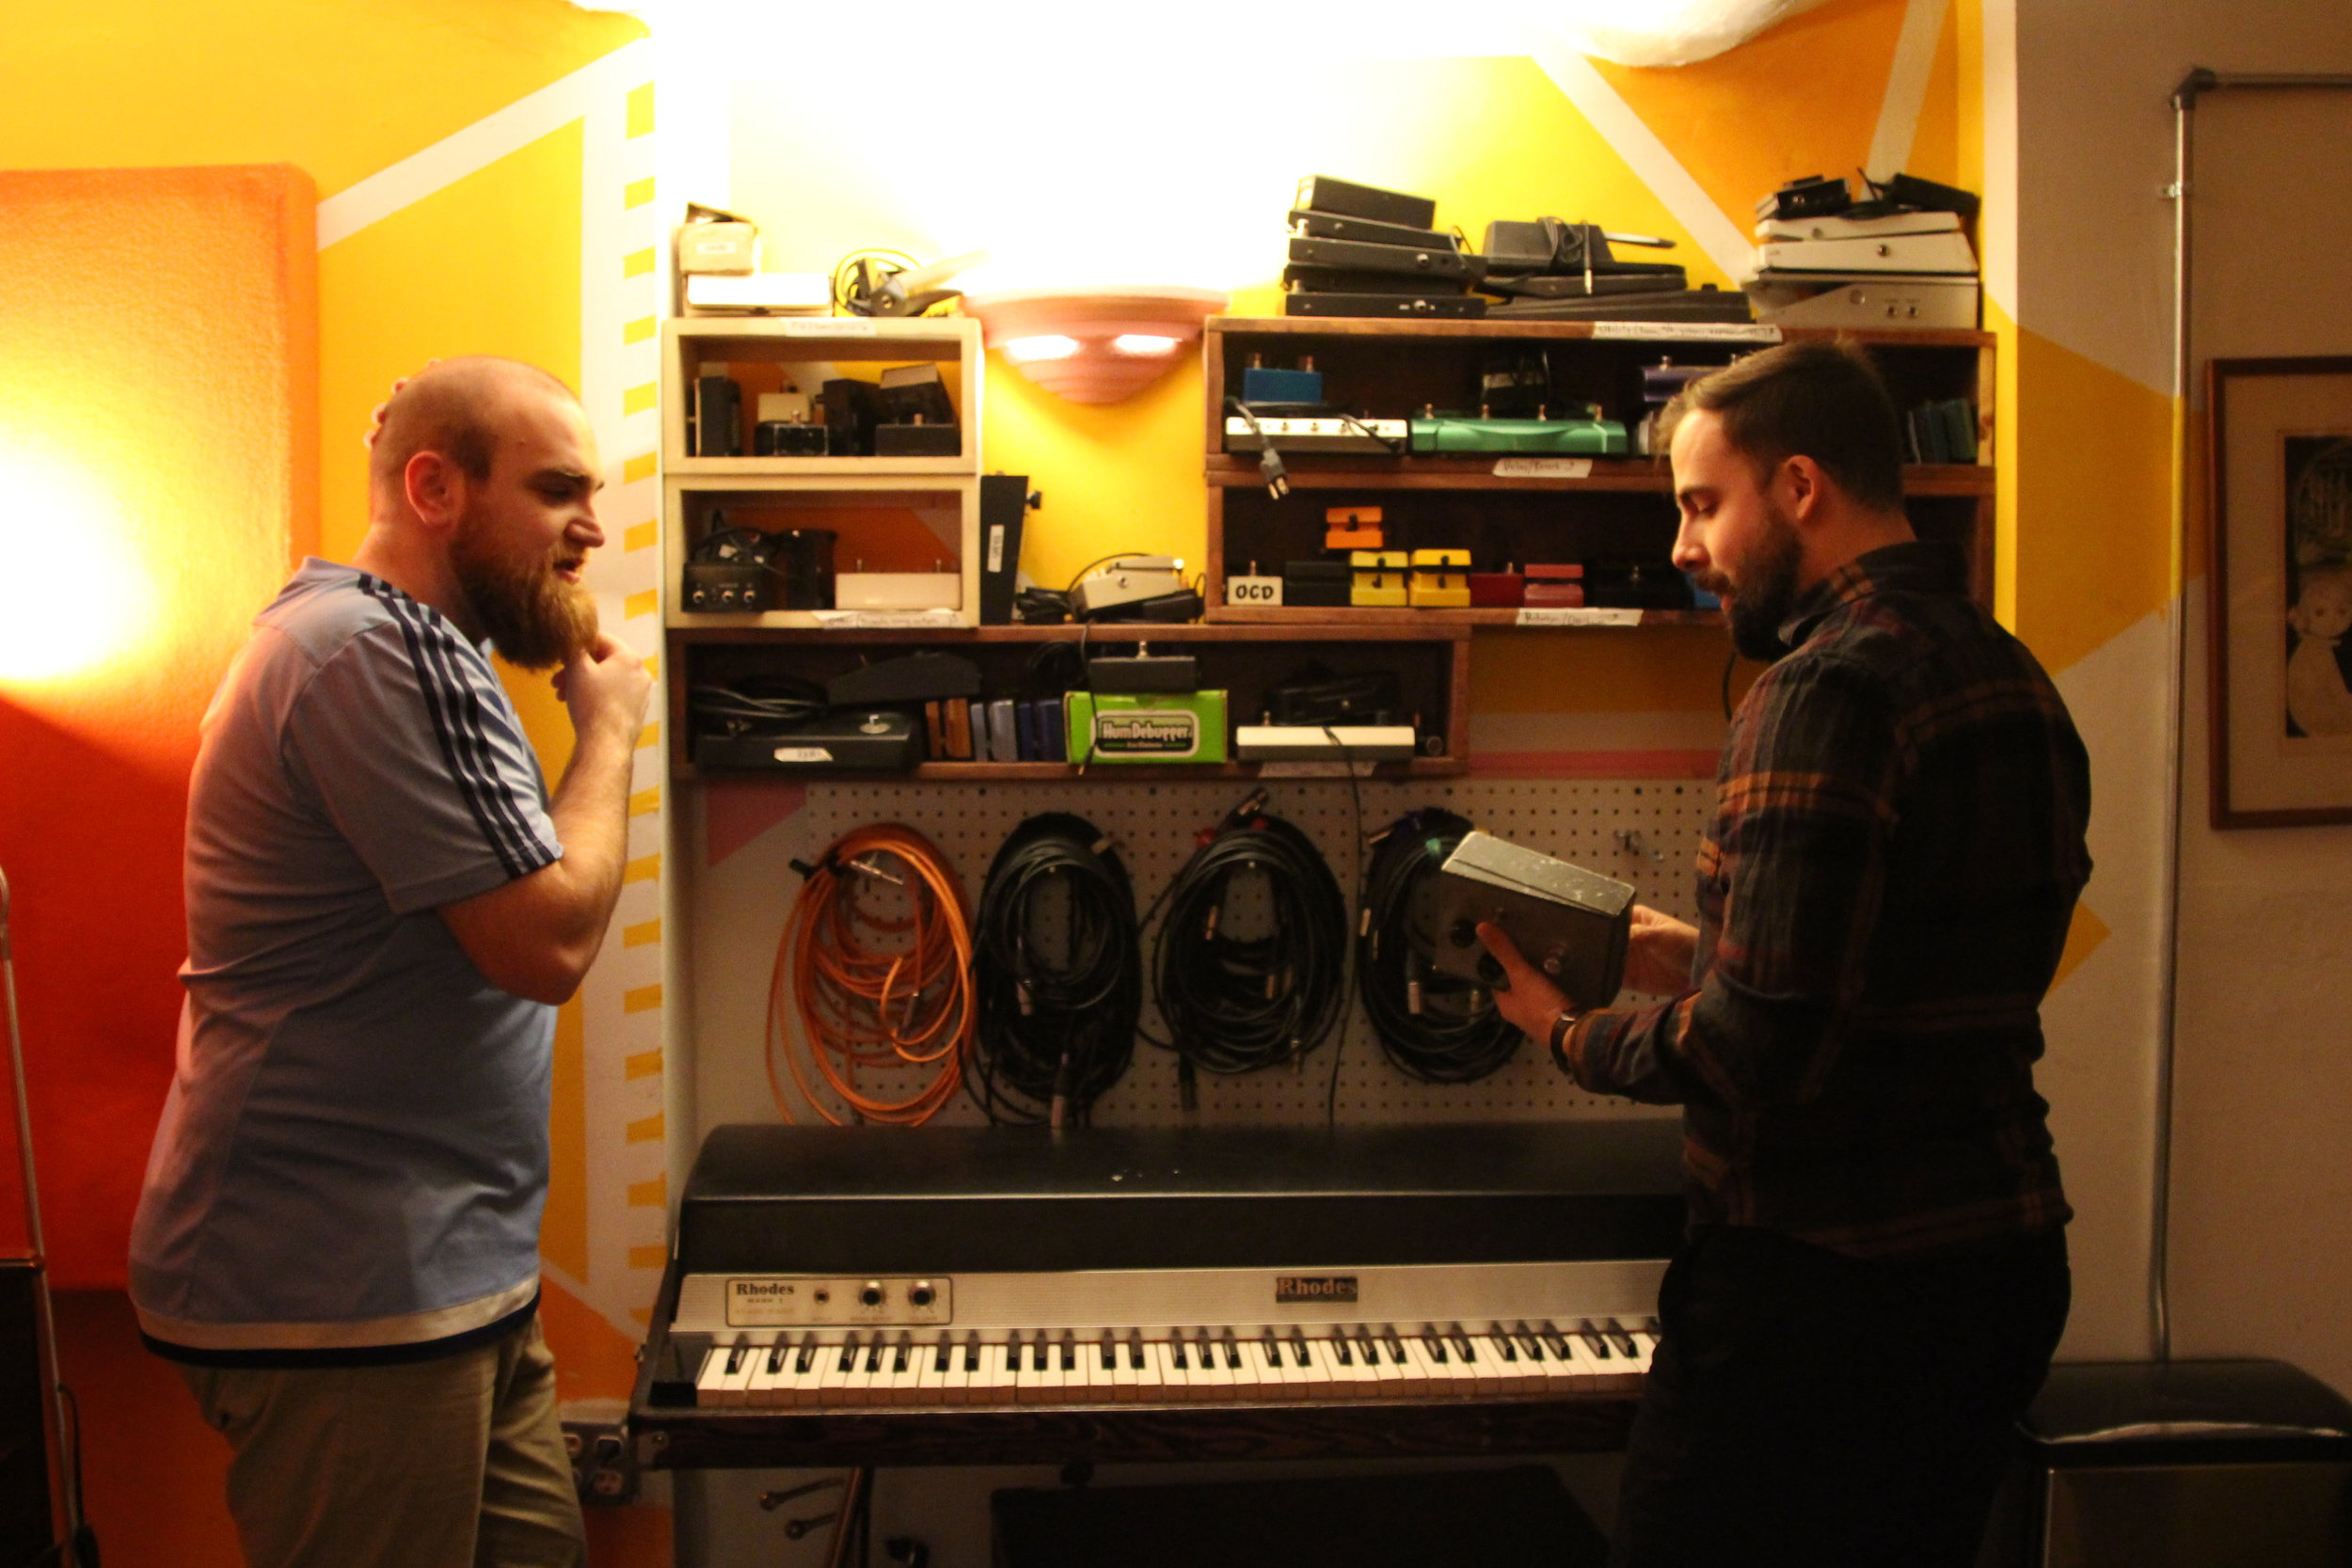 Recording at Roig Recording